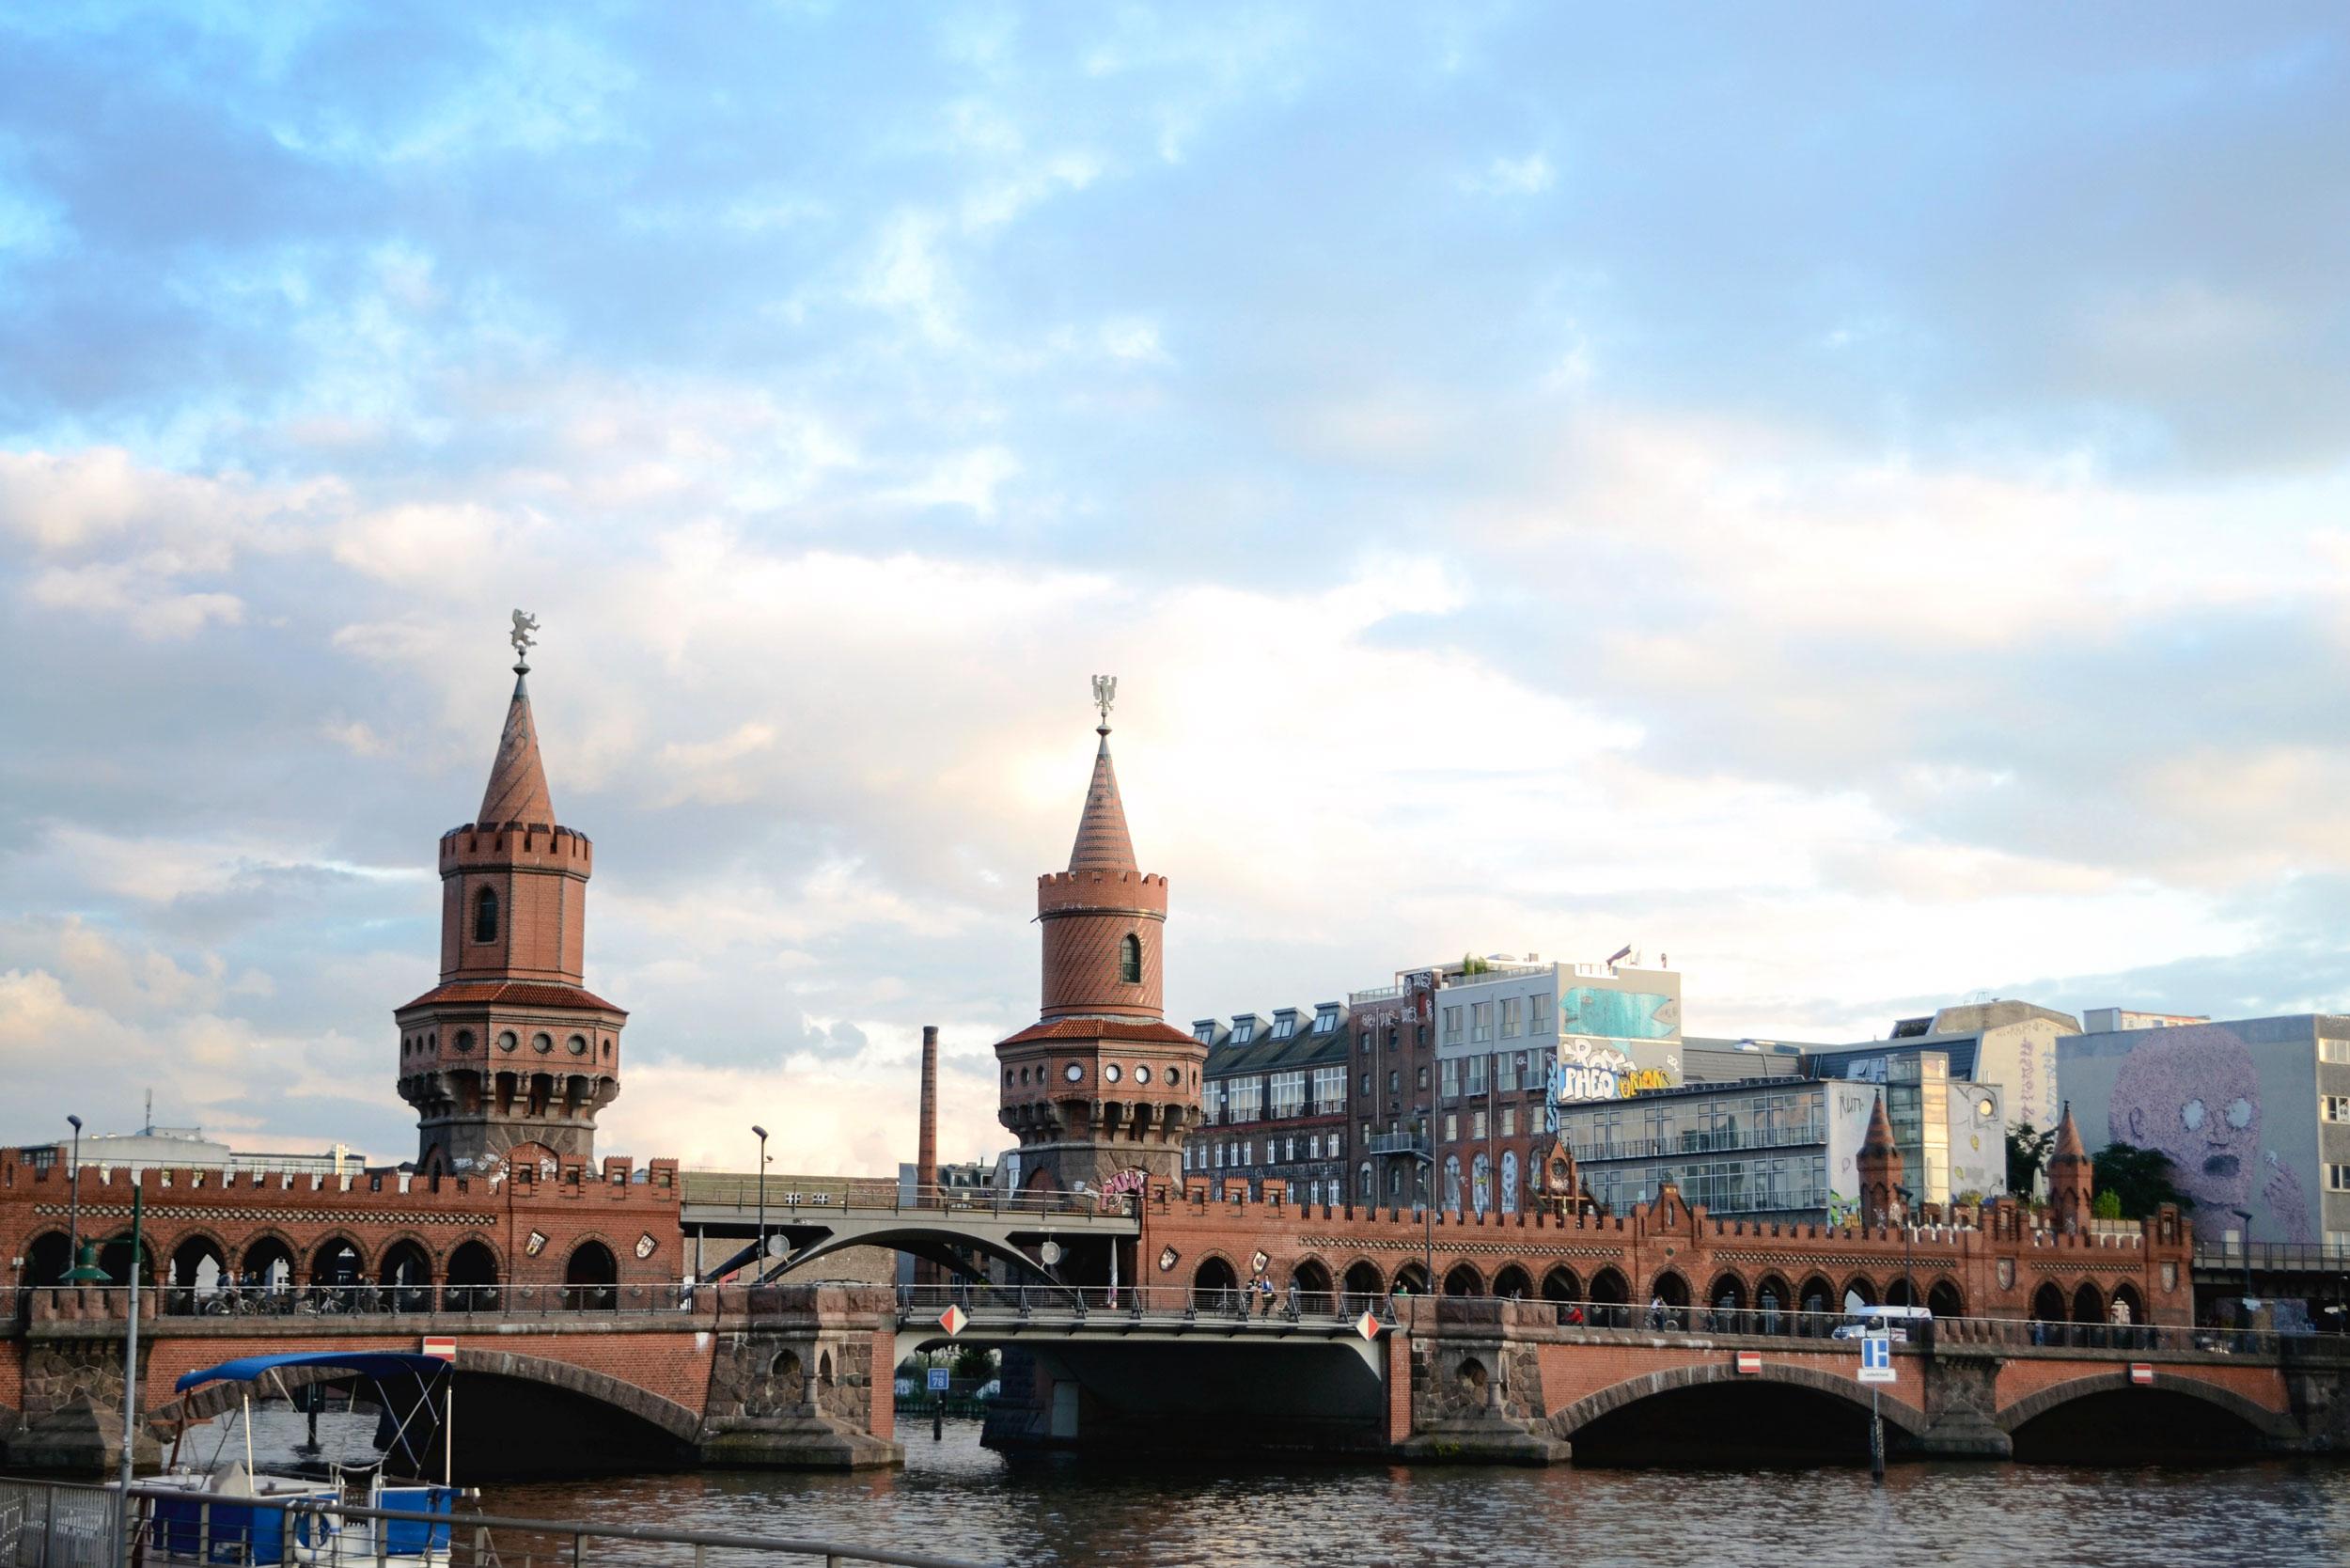 Oberbaumbrücke Bridge and artwork from the nearby Eastside Gallery below.